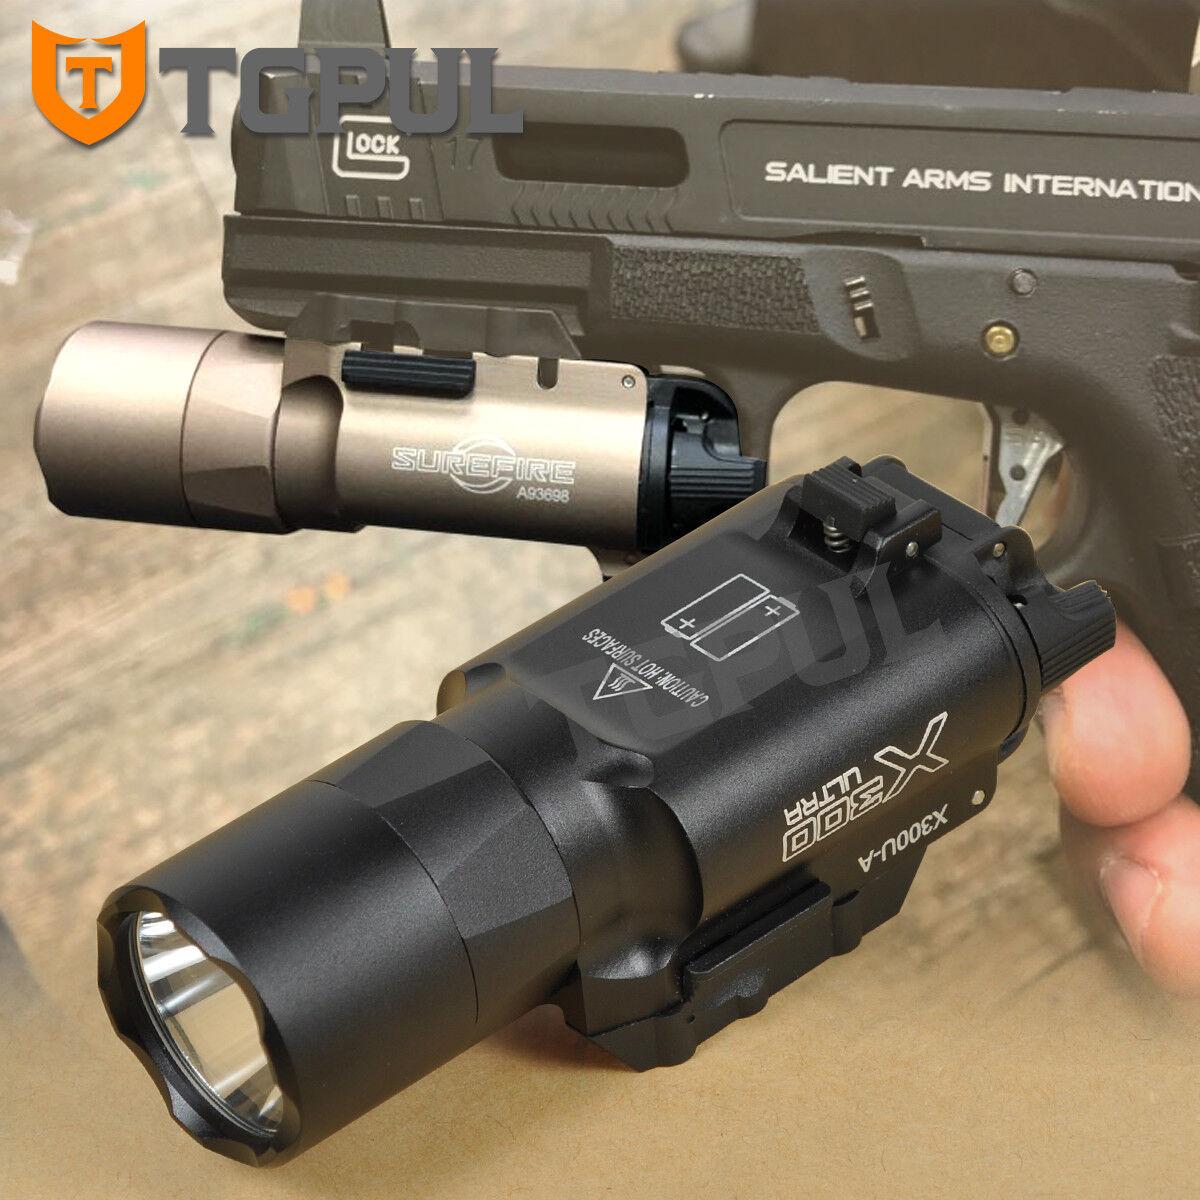 X300 Ultra light weapon Luz 350 LM Universal QD clon de montaje en carril Picatinny